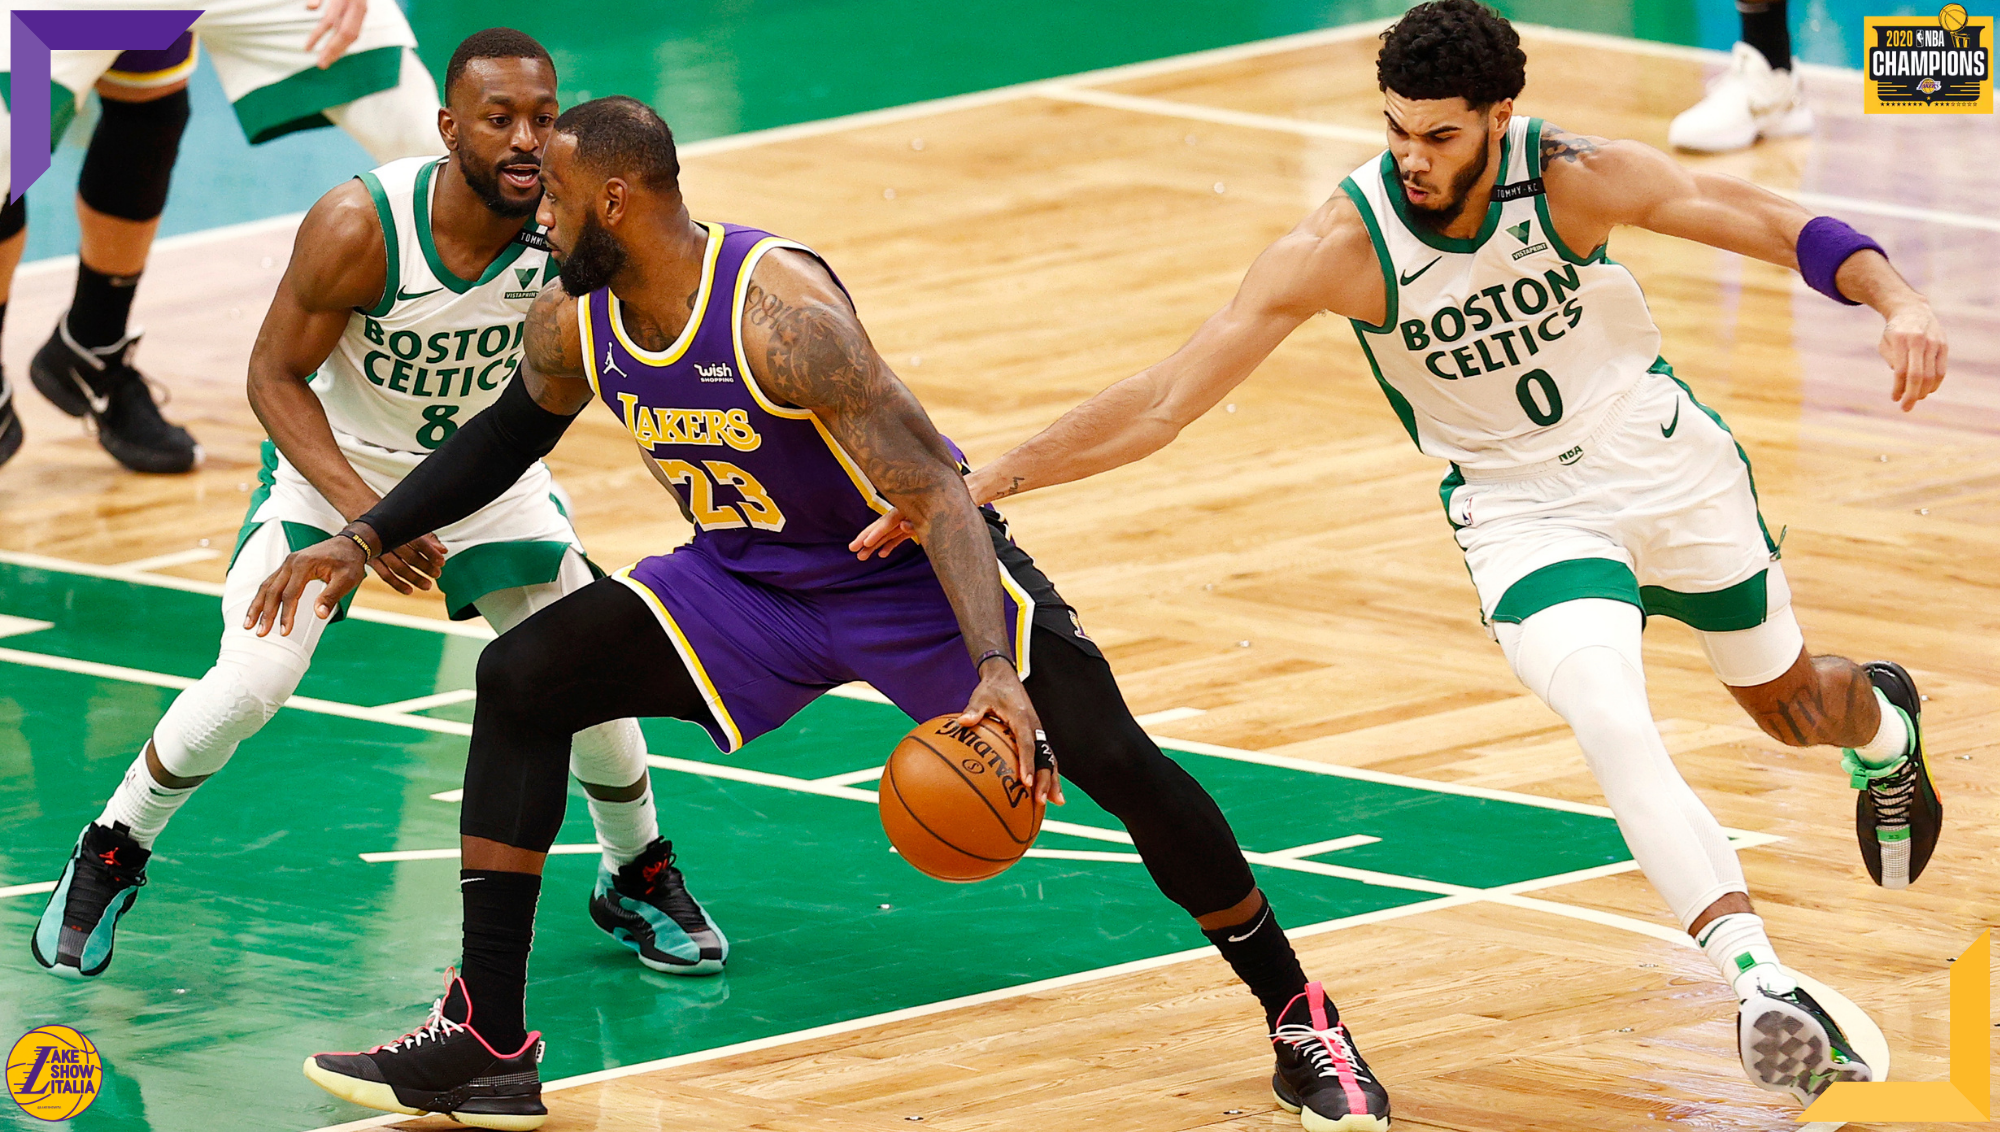 Kemba Walker, LeBron James and Jayson Tatum, Los Angeles Lakers vs Boston Celtics